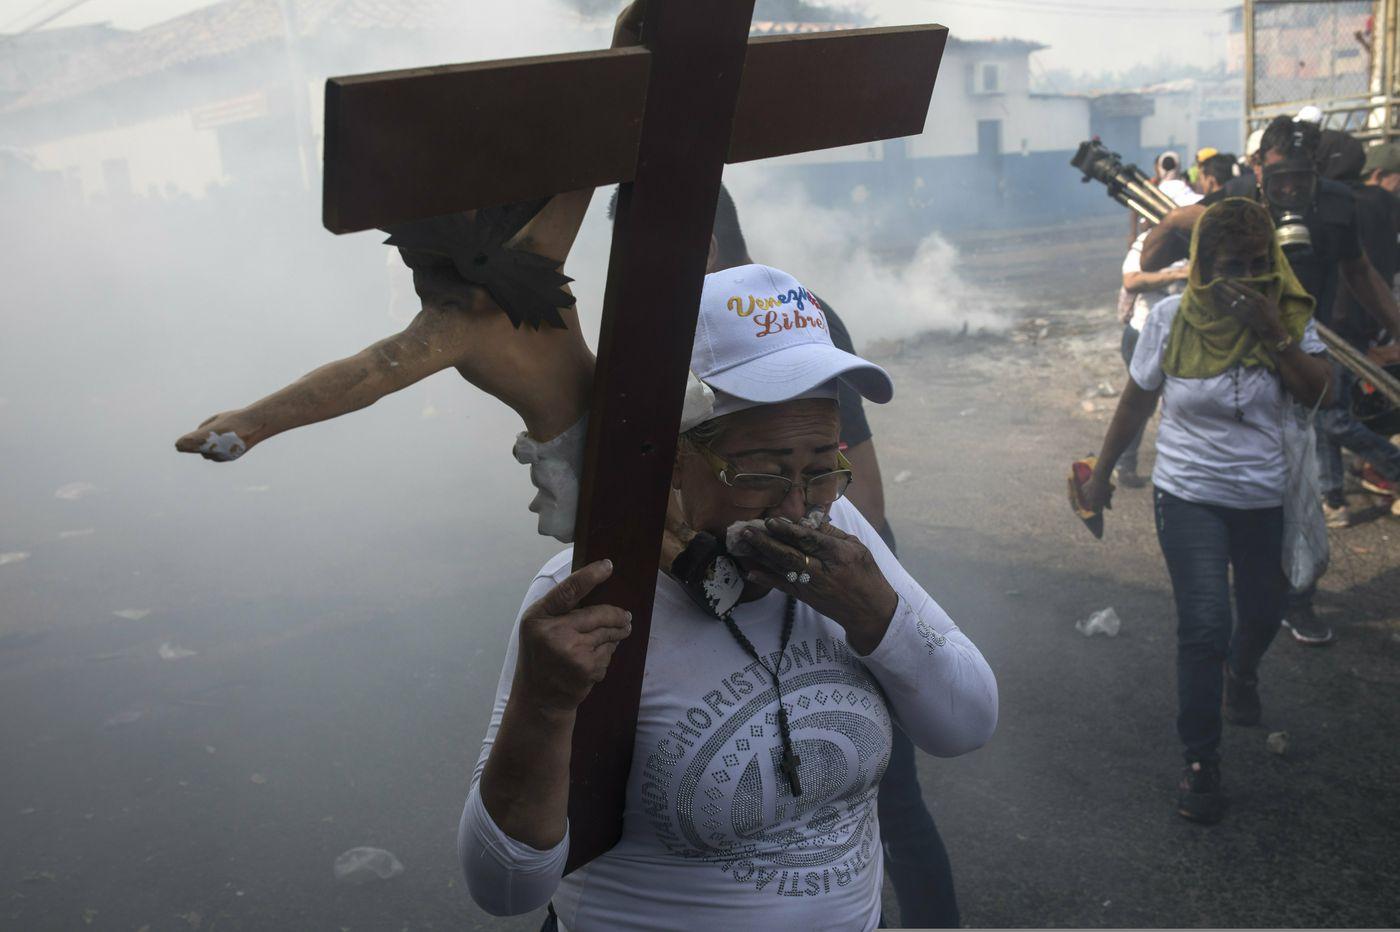 Guaidó and supporters prepare to defy Maduro's blockade of aid in Venezuela